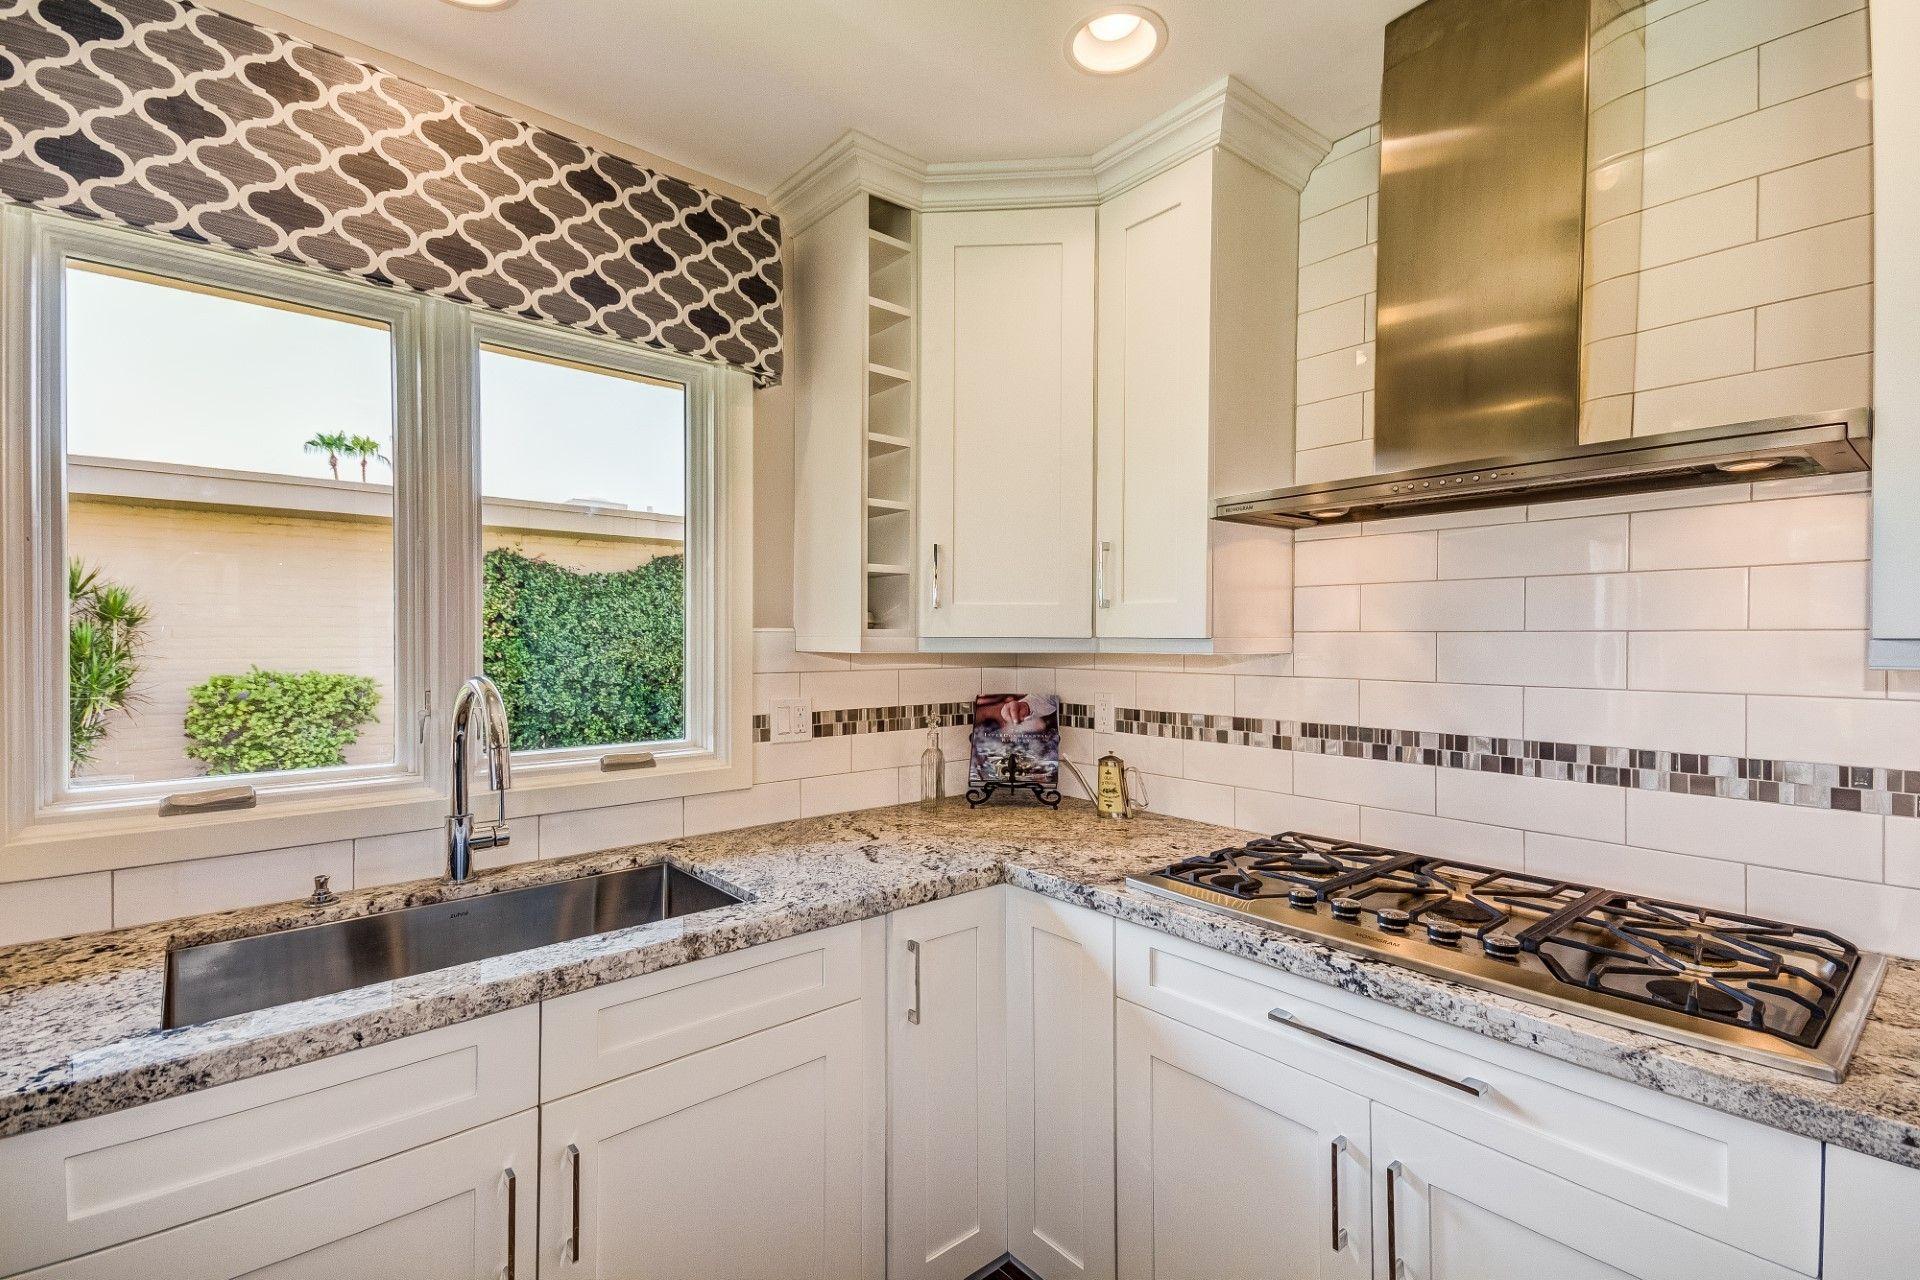 San Carlos Kitchens By Good Guys White Subway Tiles Kitchen Backsplash White Subway Tile Kitchen Kitchen Remodel